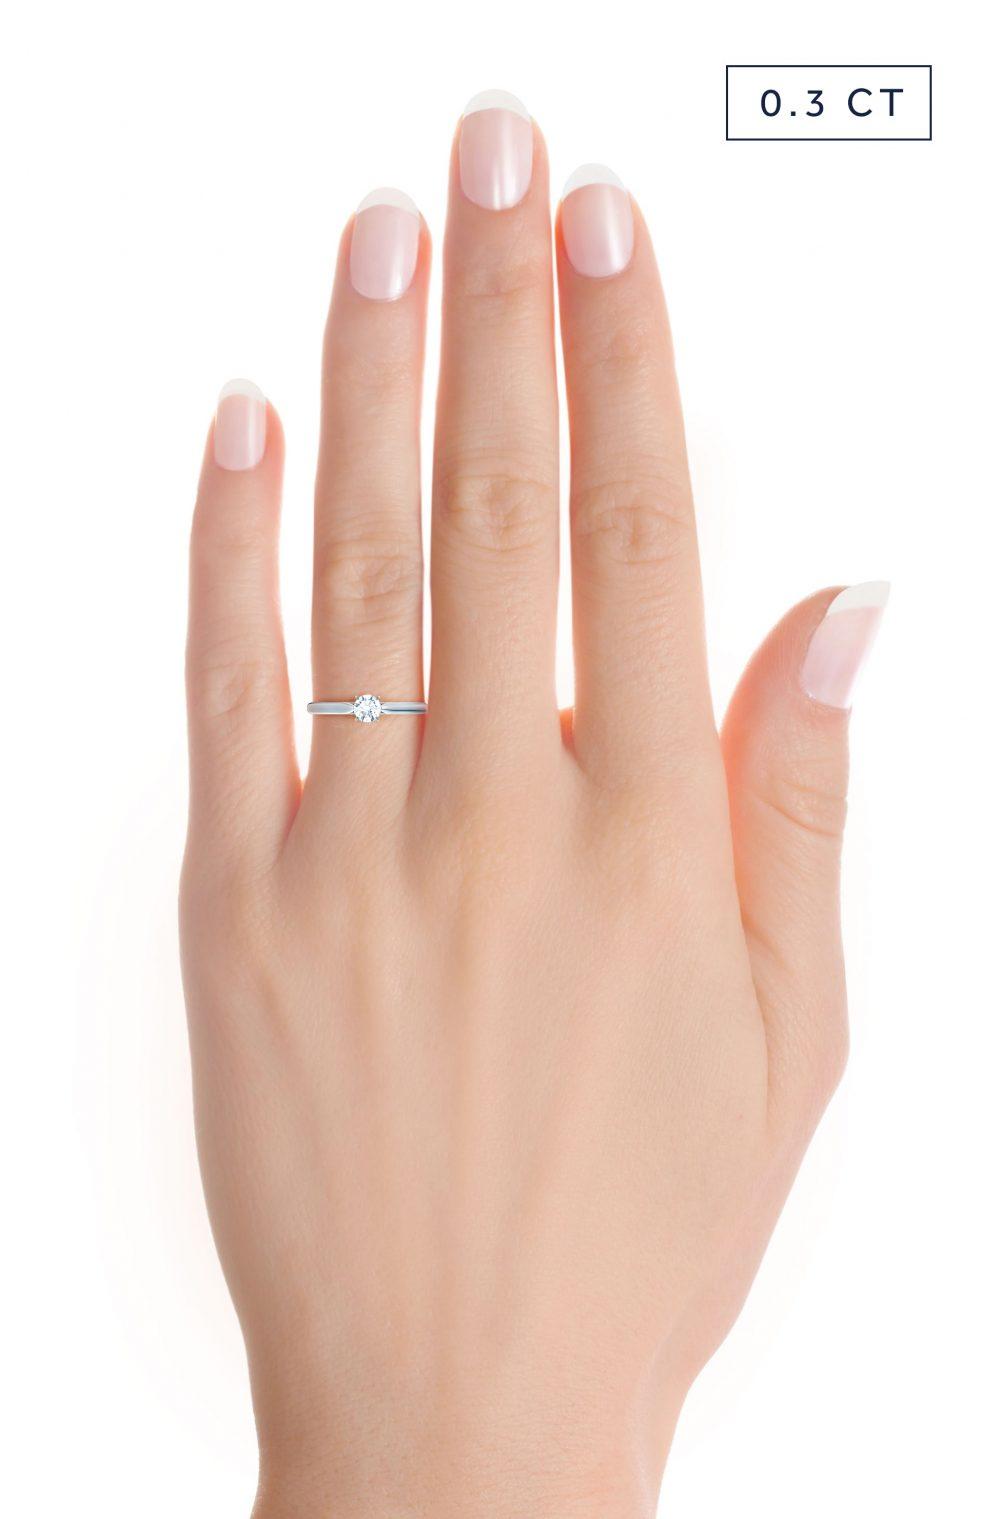 0.3ct-diamond-on-hand-1-1